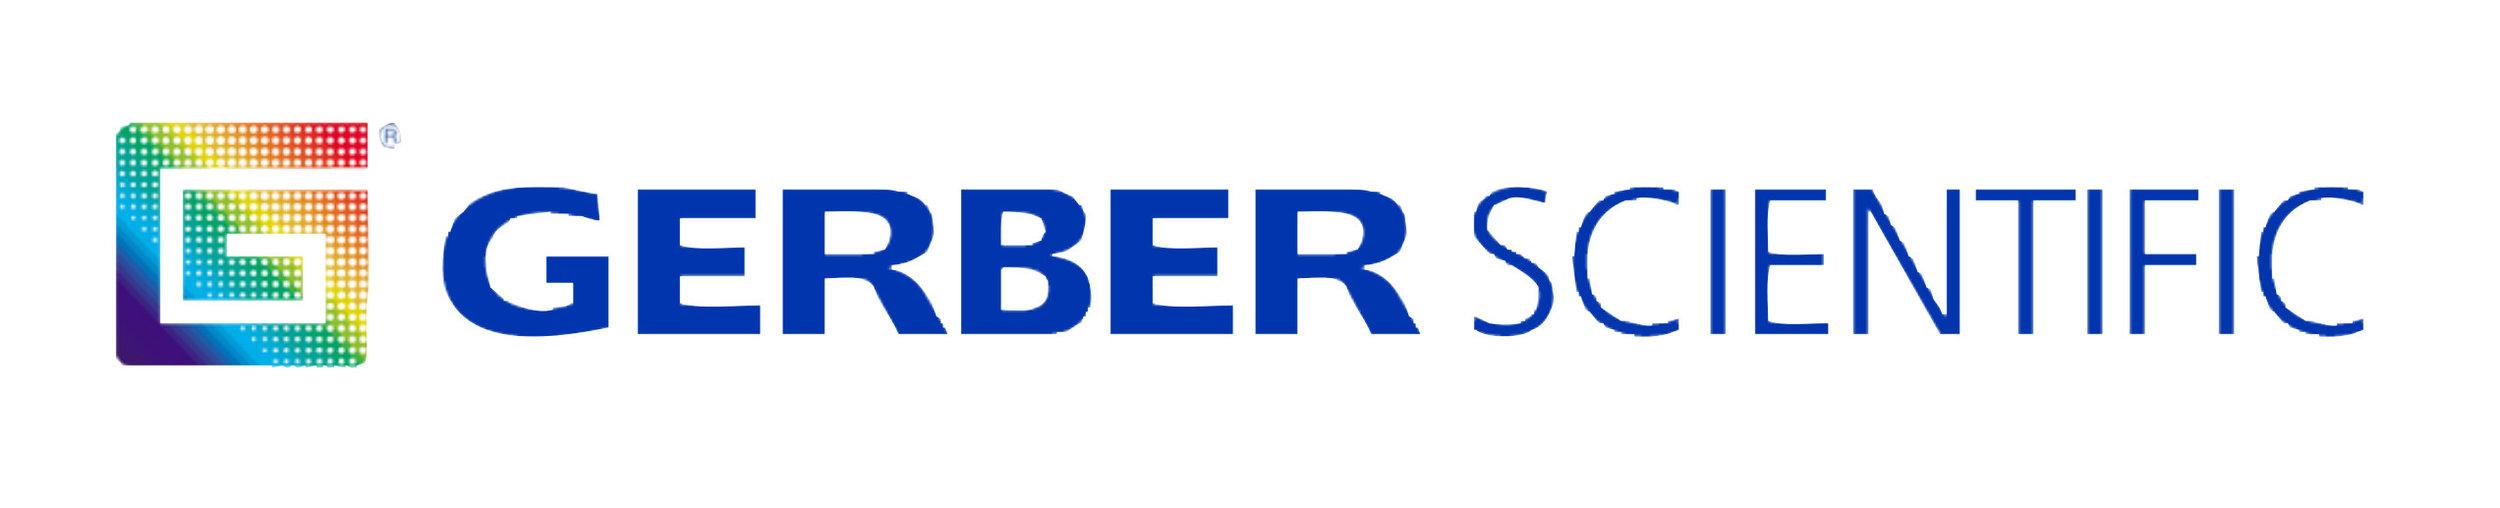 Gerber_Scientific_Logo.jpg